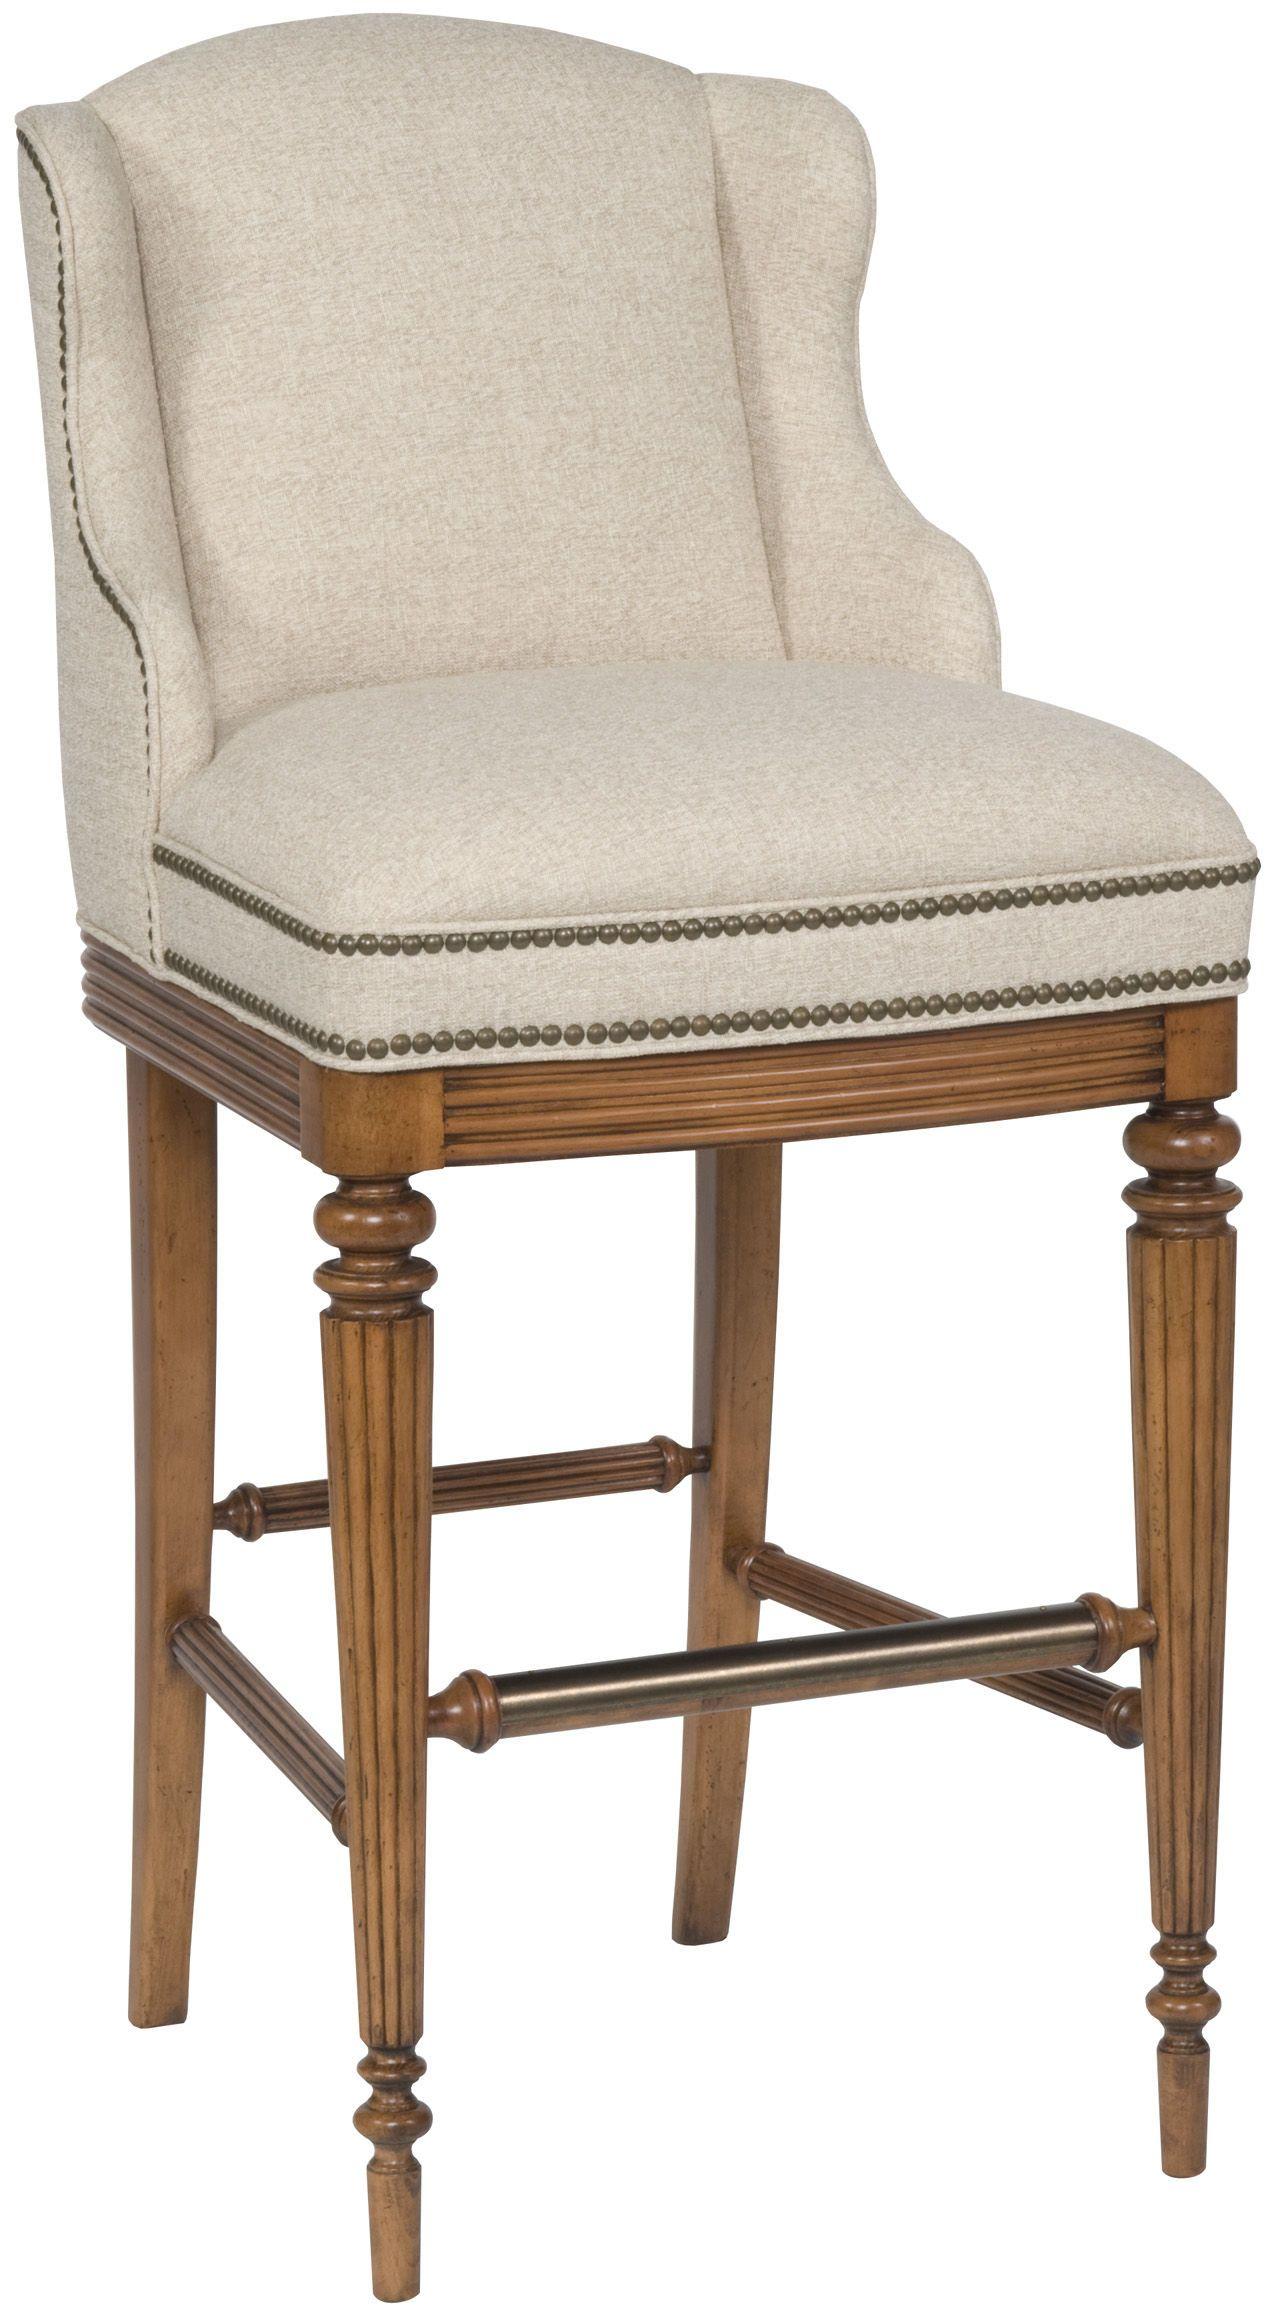 Vanguard Dining Room Wing Bar Stool V61 BS   Vanguard Furniture   Conover,  NC (kitchen Island Chairs I Love)